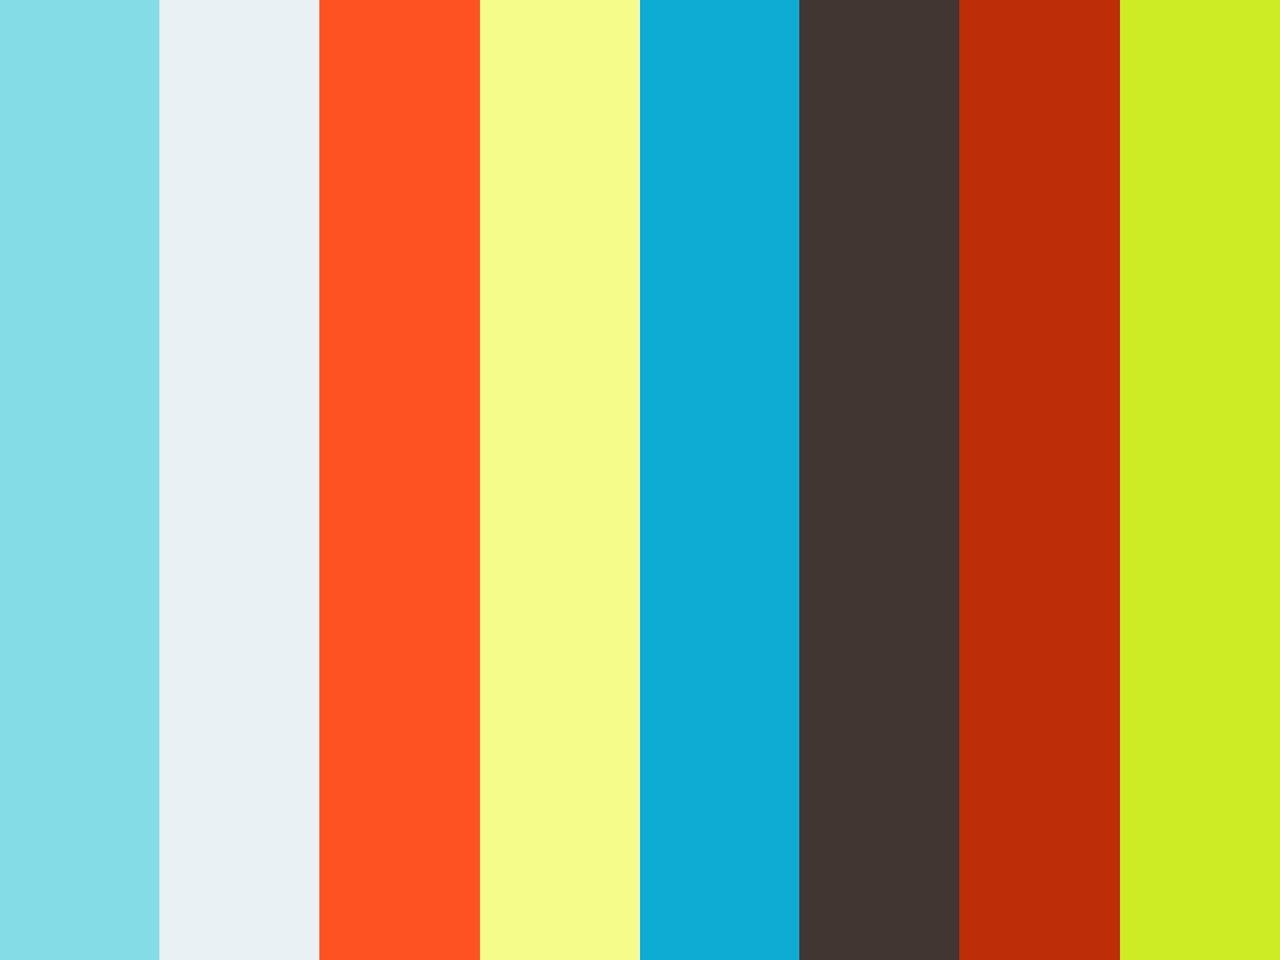 Roger Dubuis - BTS Pub Pulsion